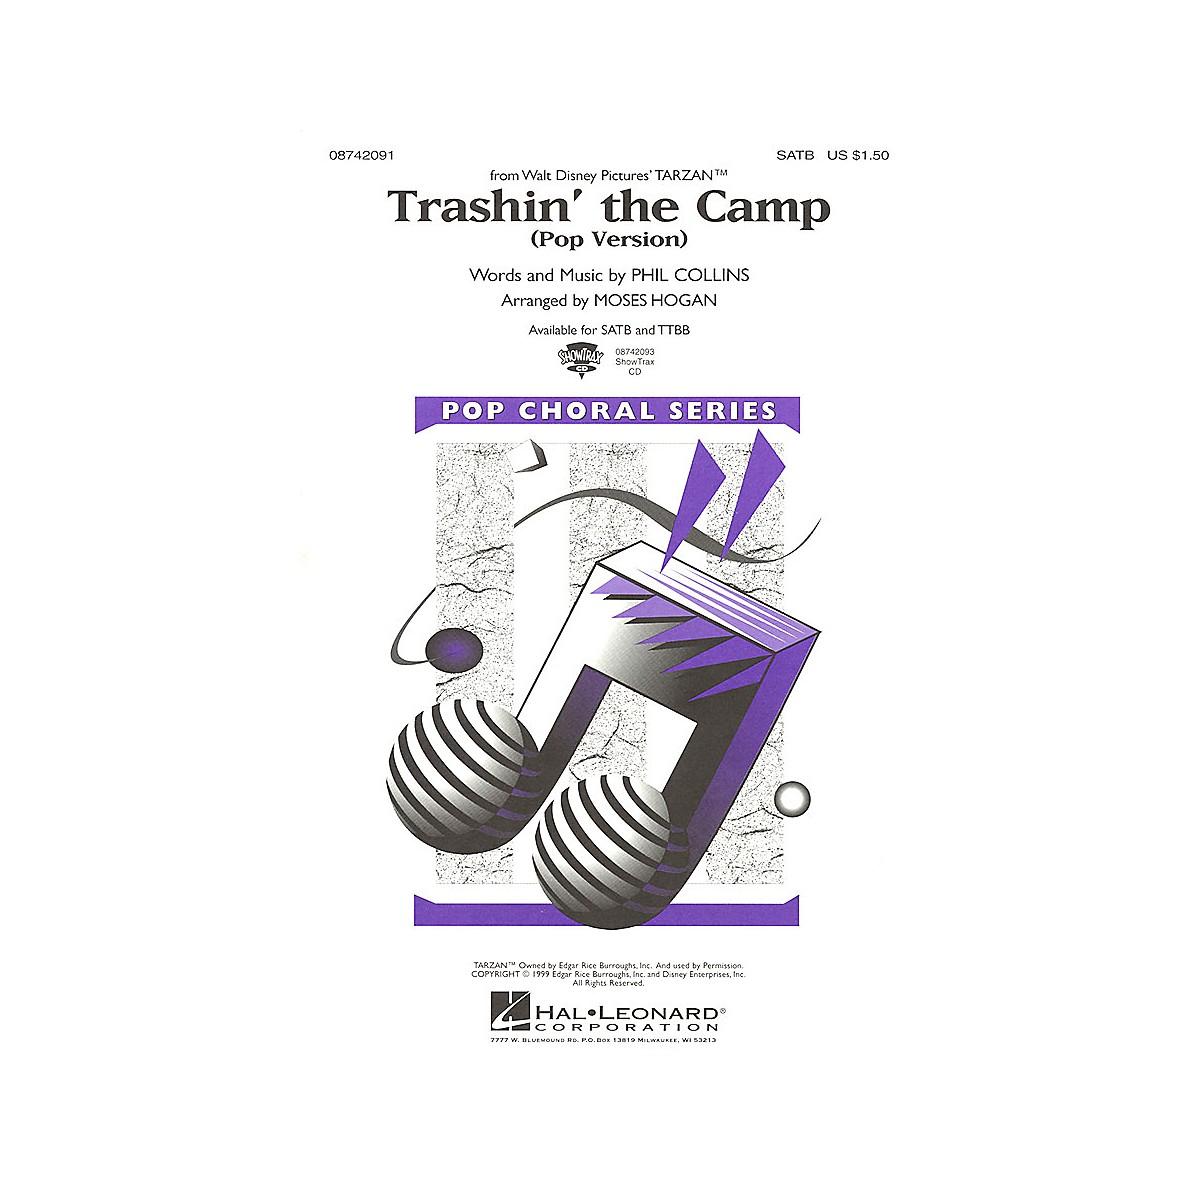 Hal Leonard Trashin' the Camp (Pop Version) (from Tarzan) SATB Divisi arranged by Moses Hogan